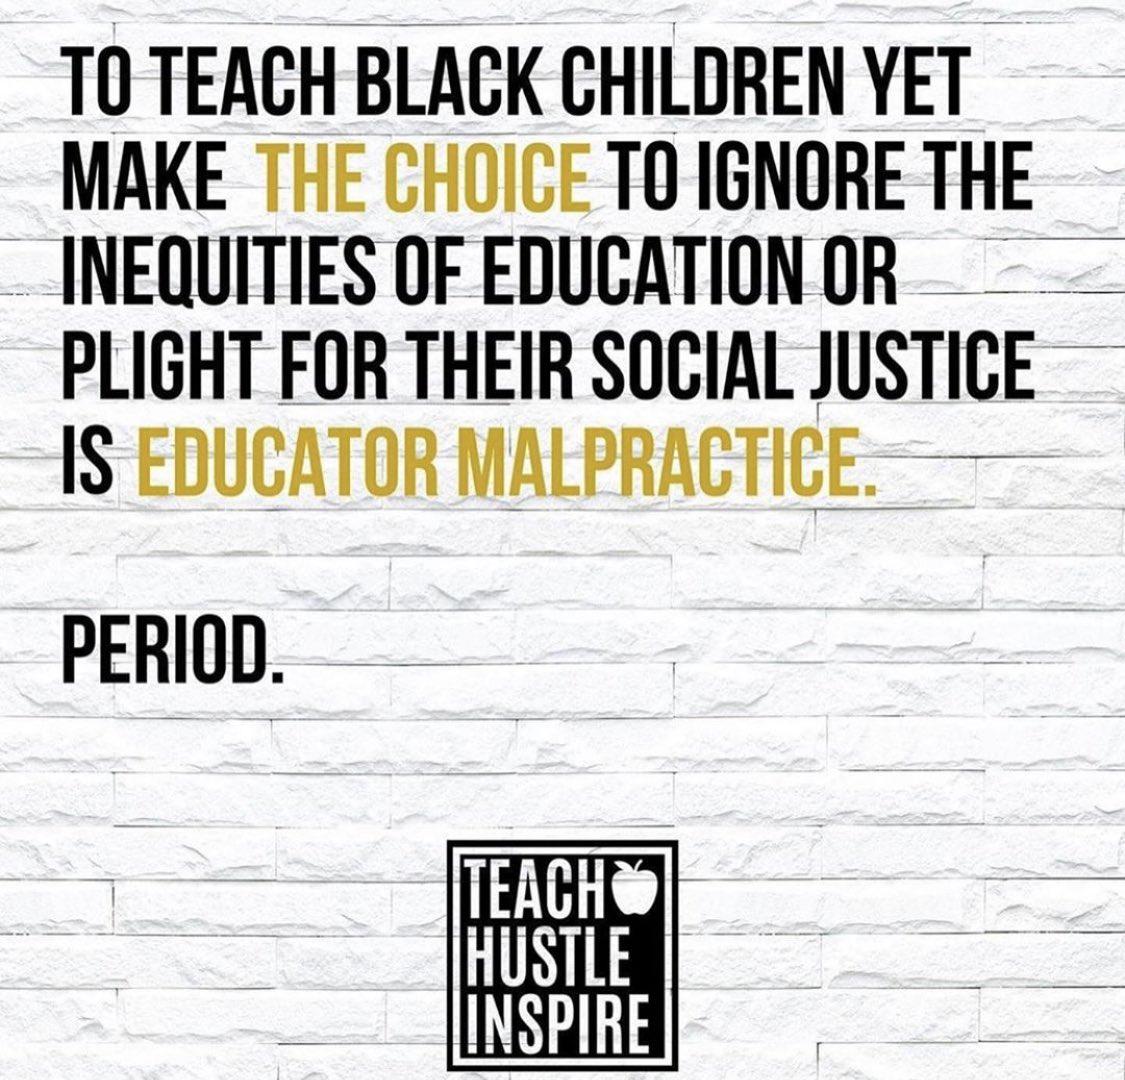 We need more dialogue.  More accountability.  More #ACTION  #blacklivesmatterpic.twitter.com/4SOu04u0yH